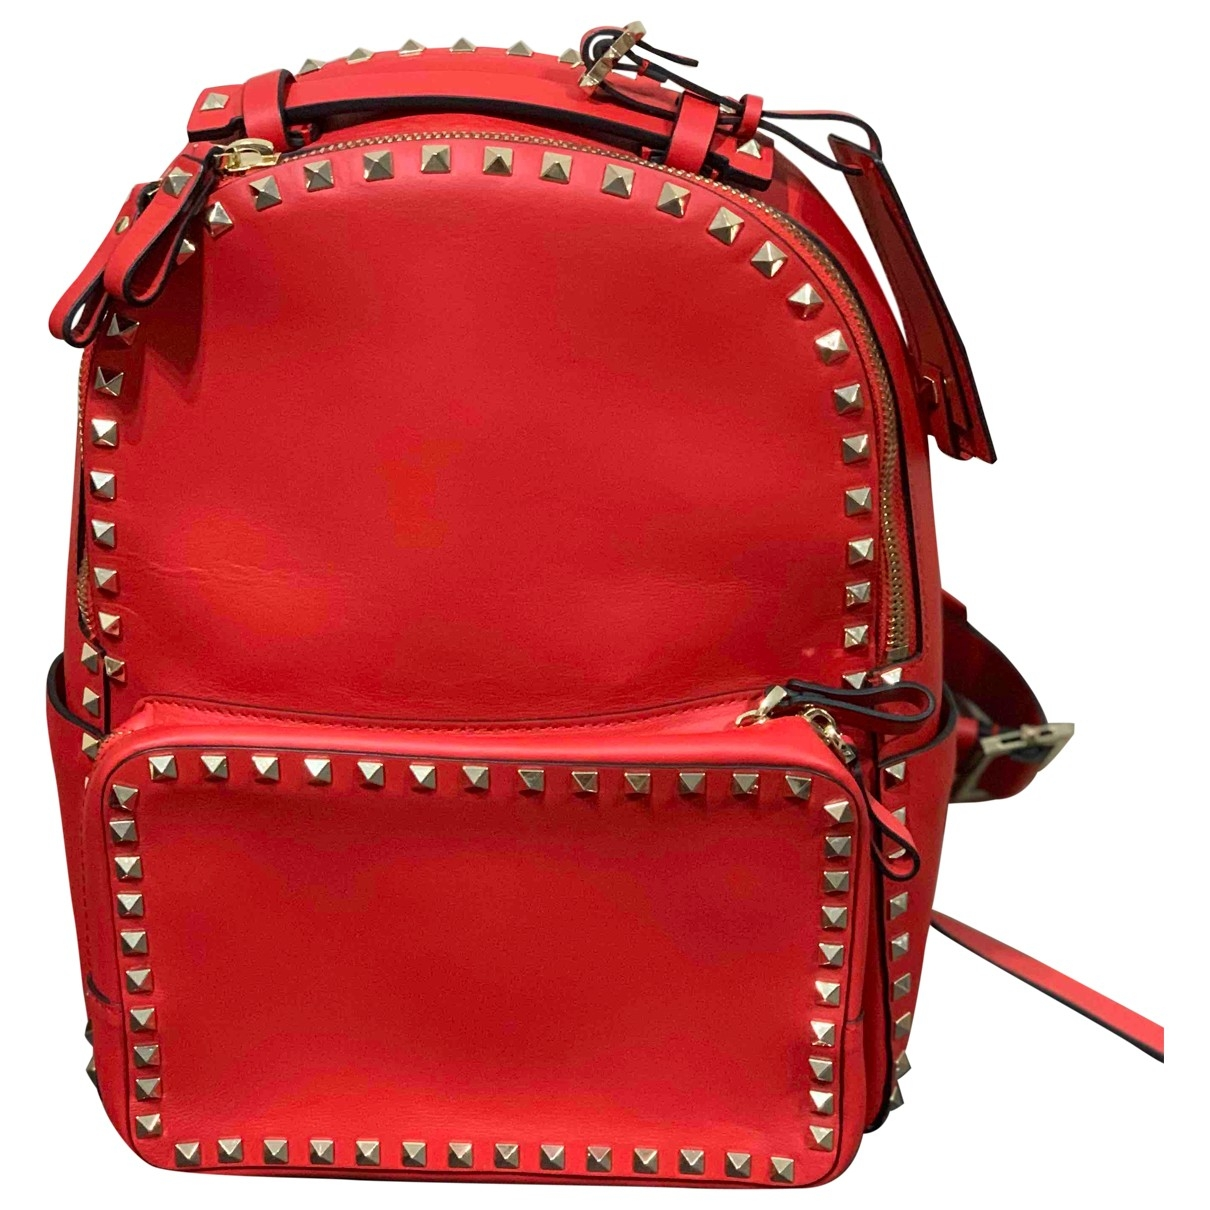 Valentino Garavani Rockstud Rucksaecke in  Rot Leder